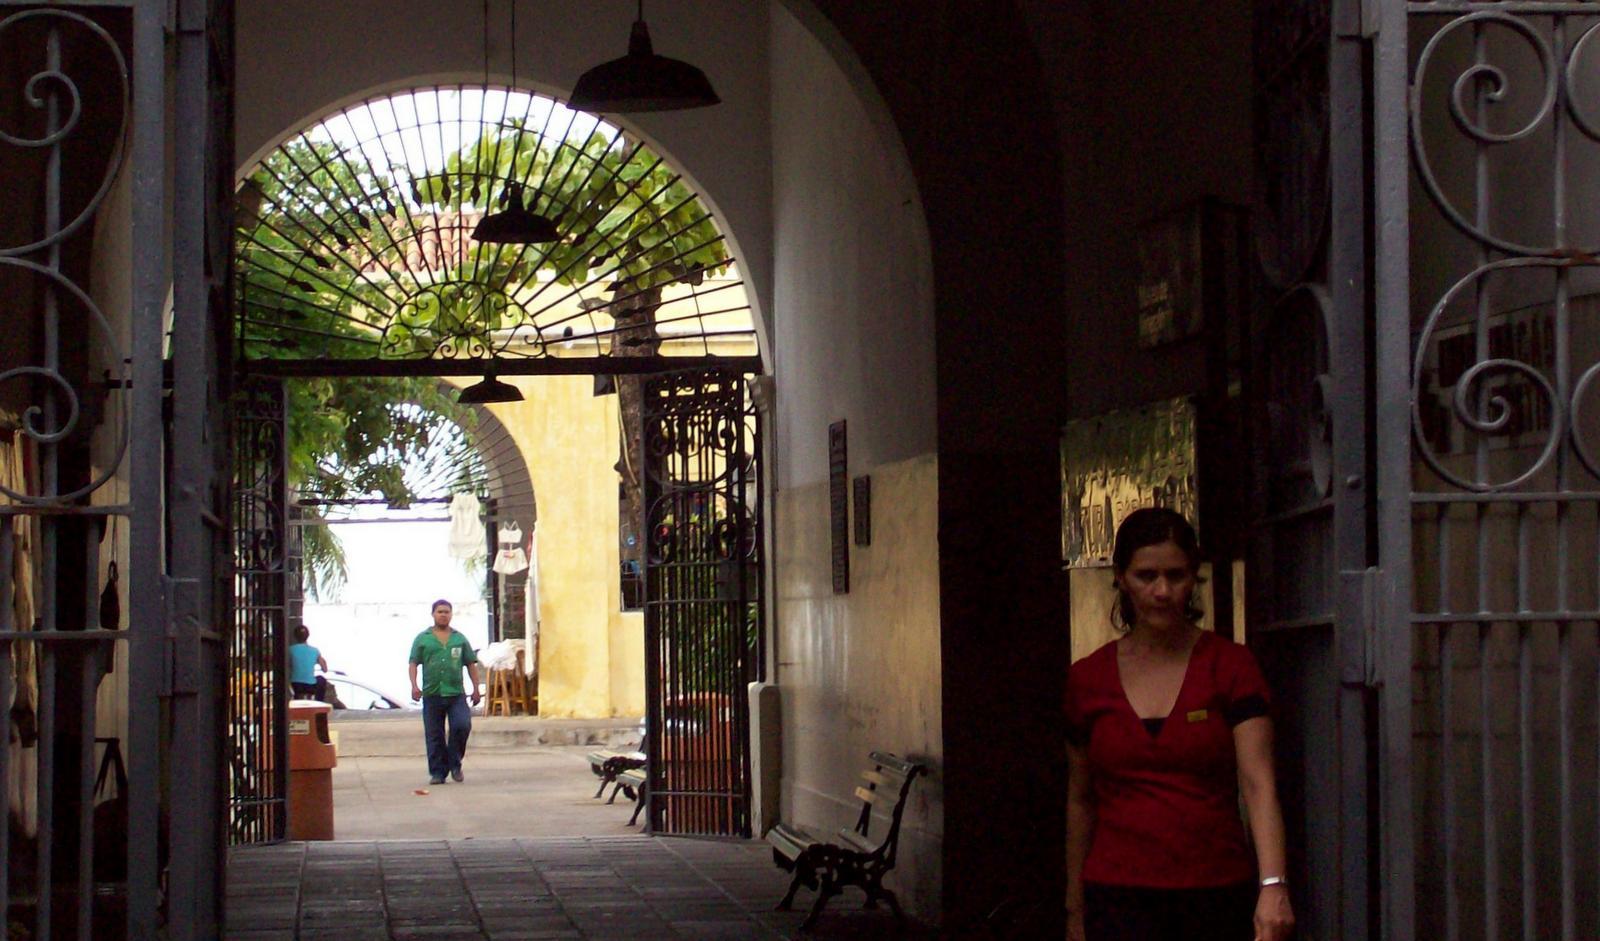 Altes Gefängnis - Centro Turismo - Fortaleza